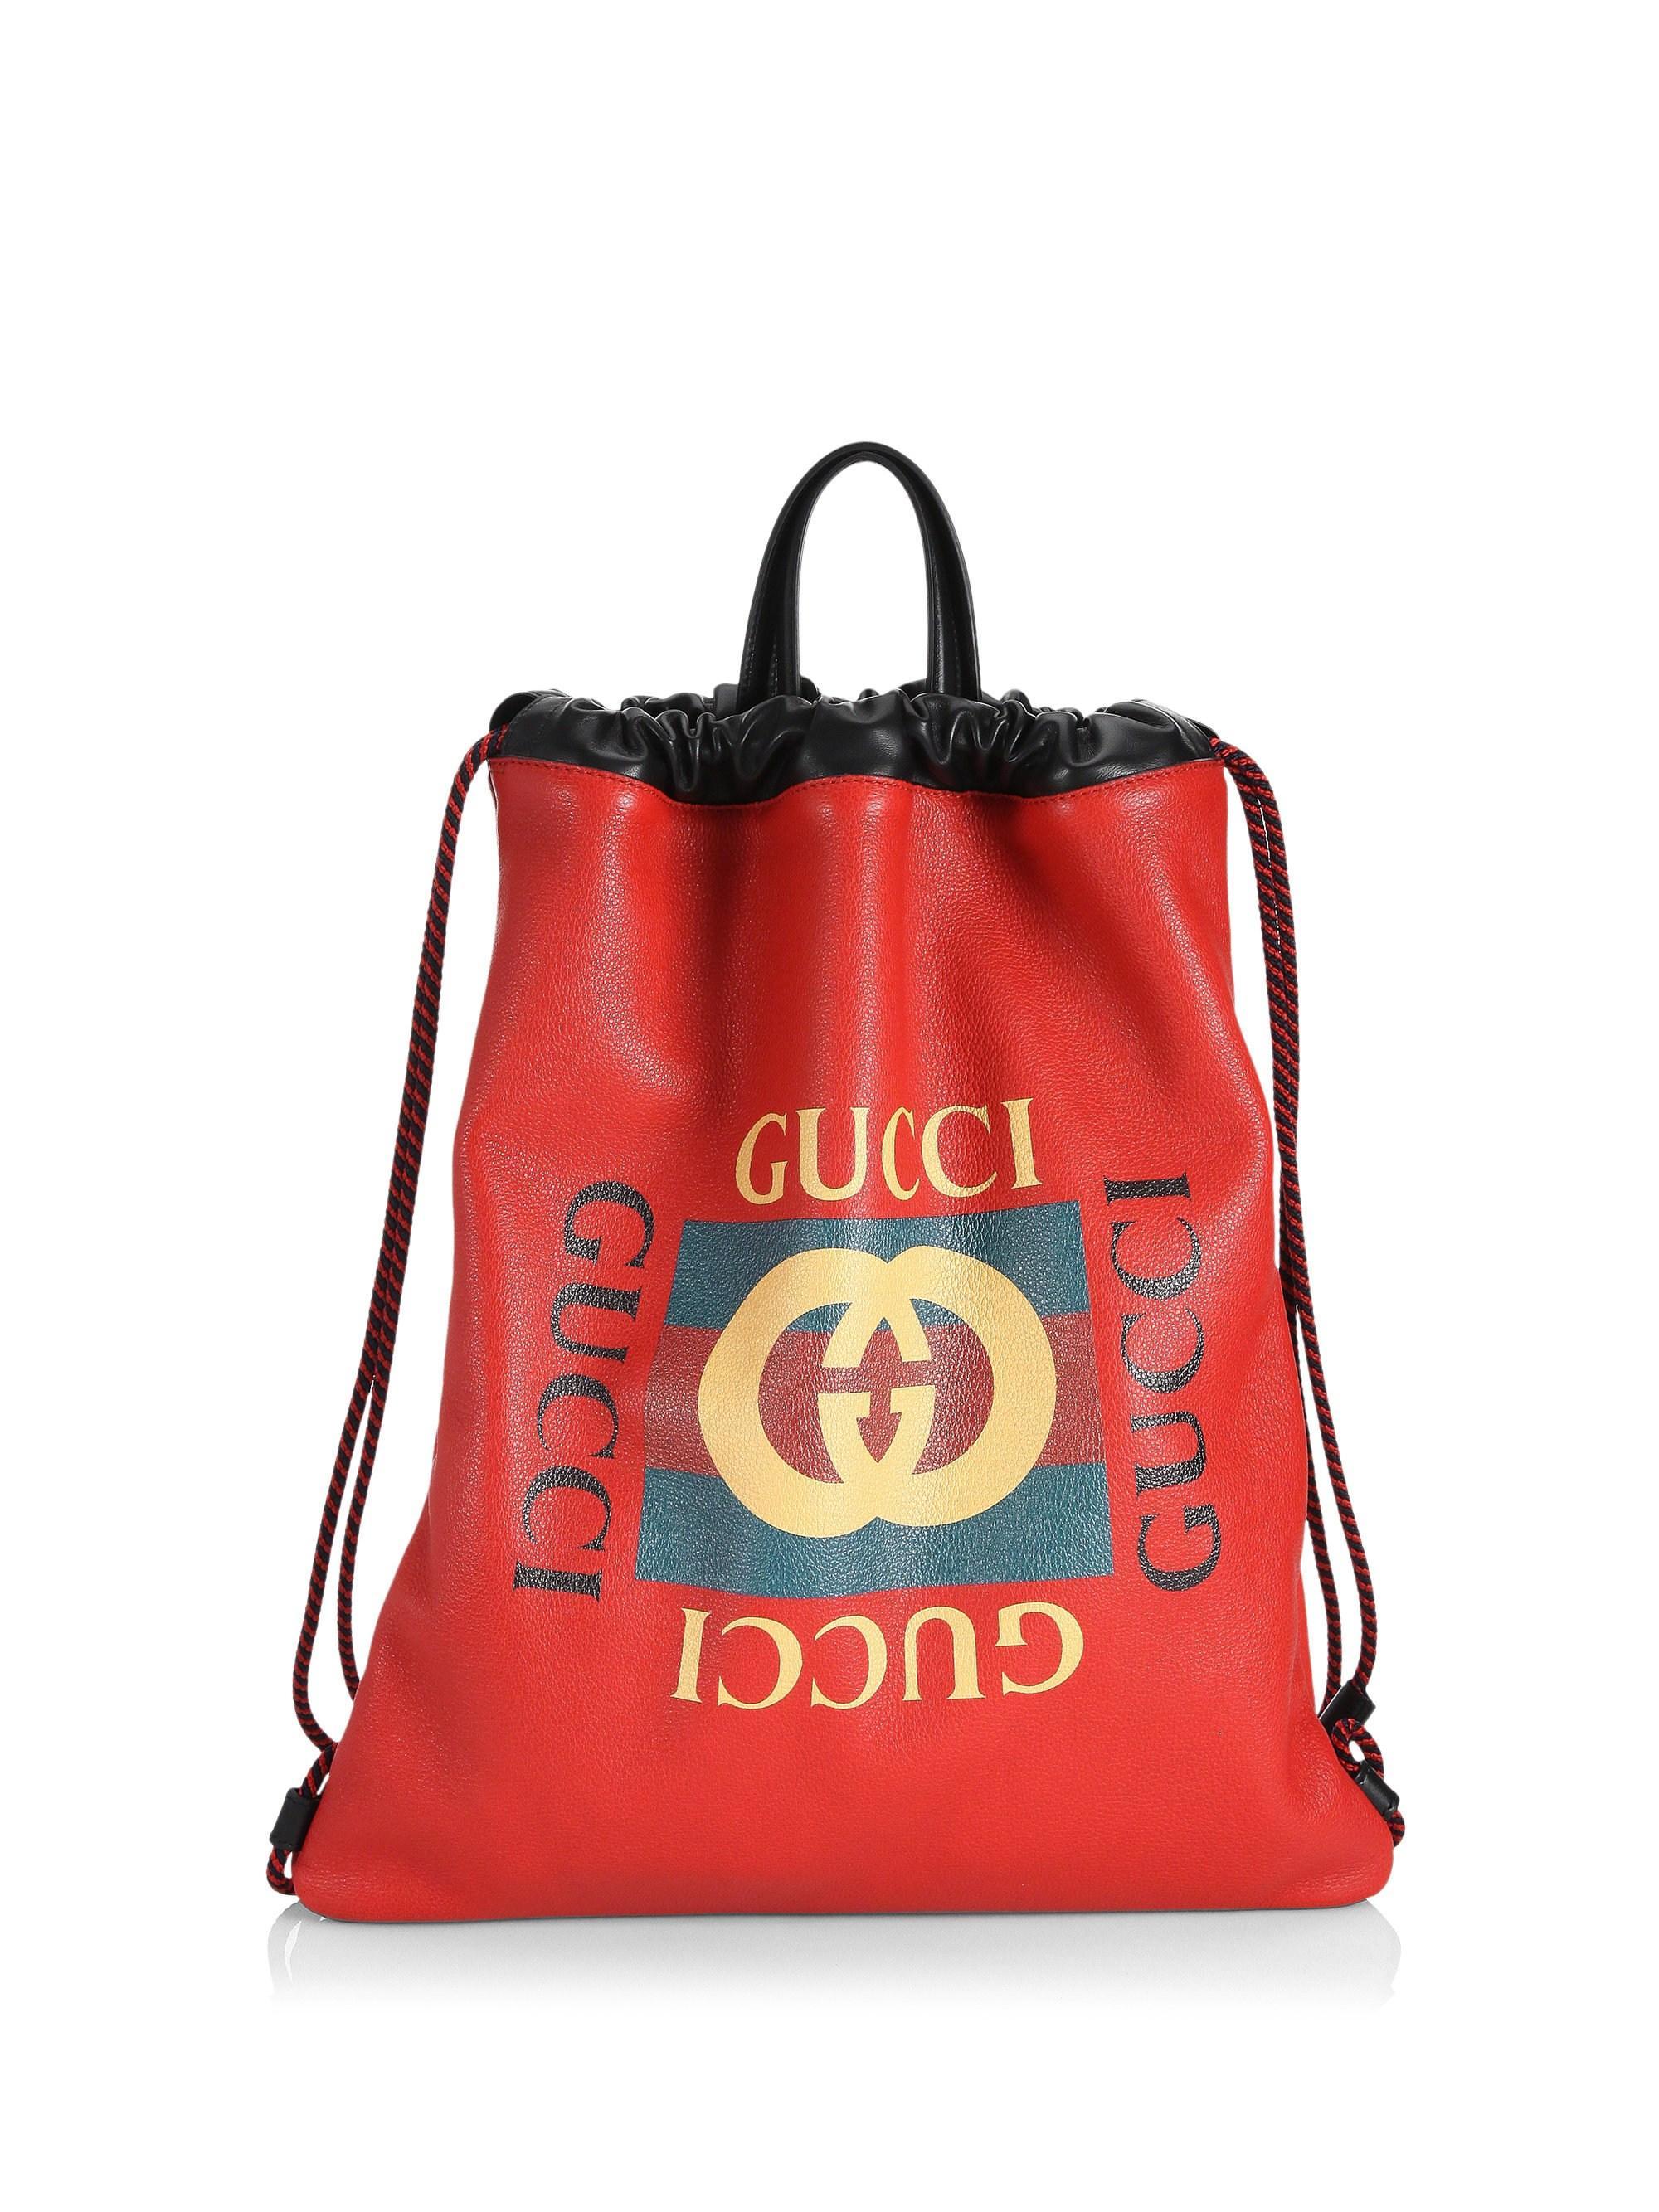 883b473bdf1c Gucci - Men s Logo Leather Drawstring Backpack - Red Green for Men - Lyst.  View fullscreen